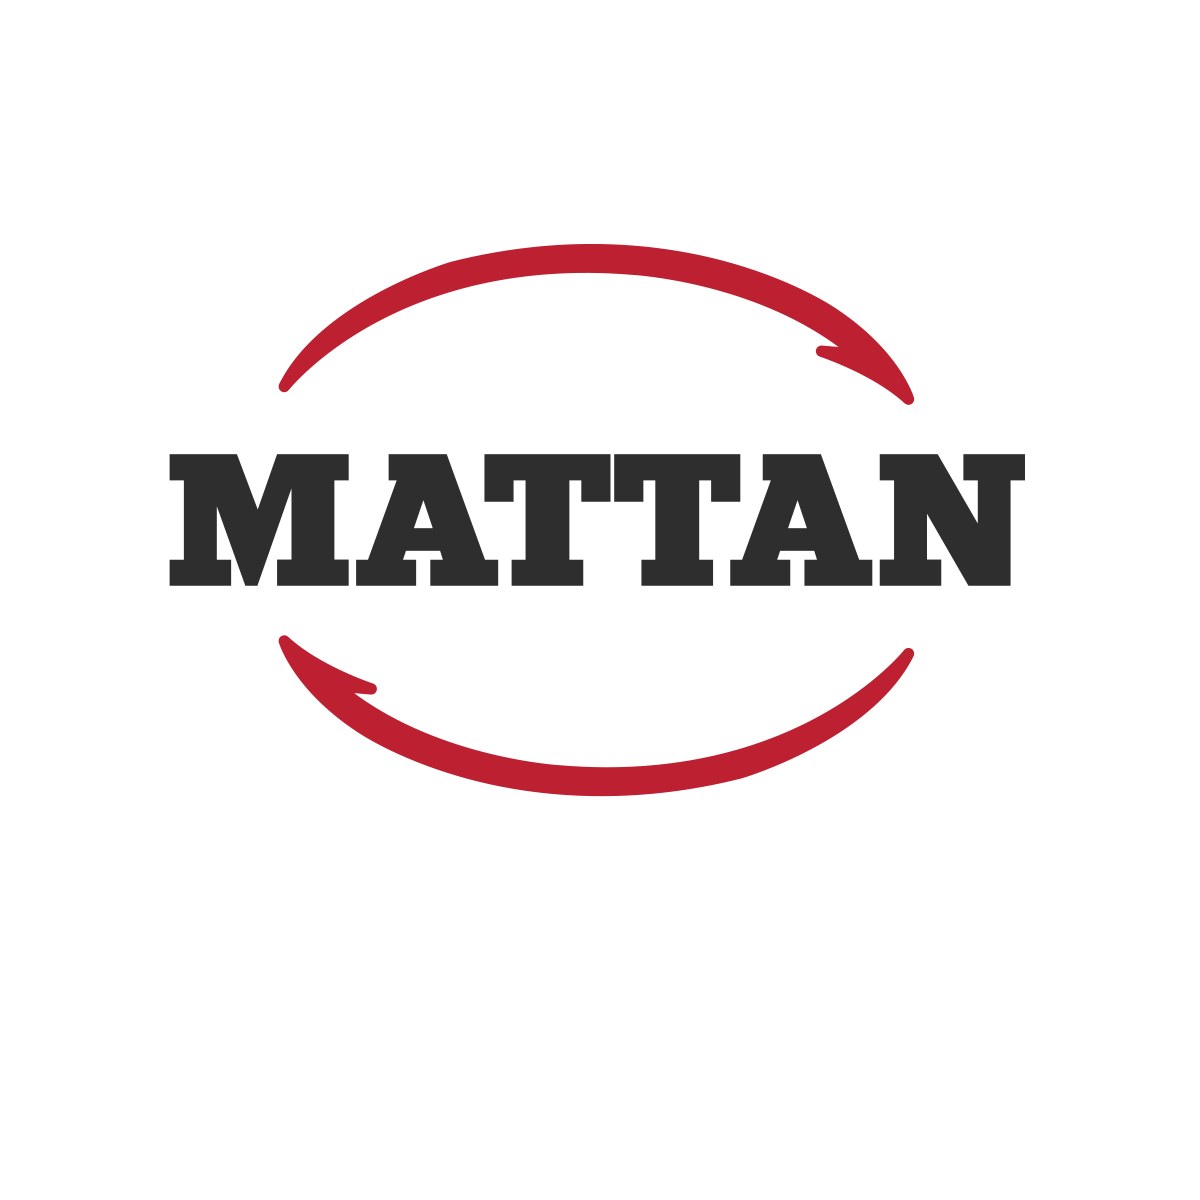 Mattan